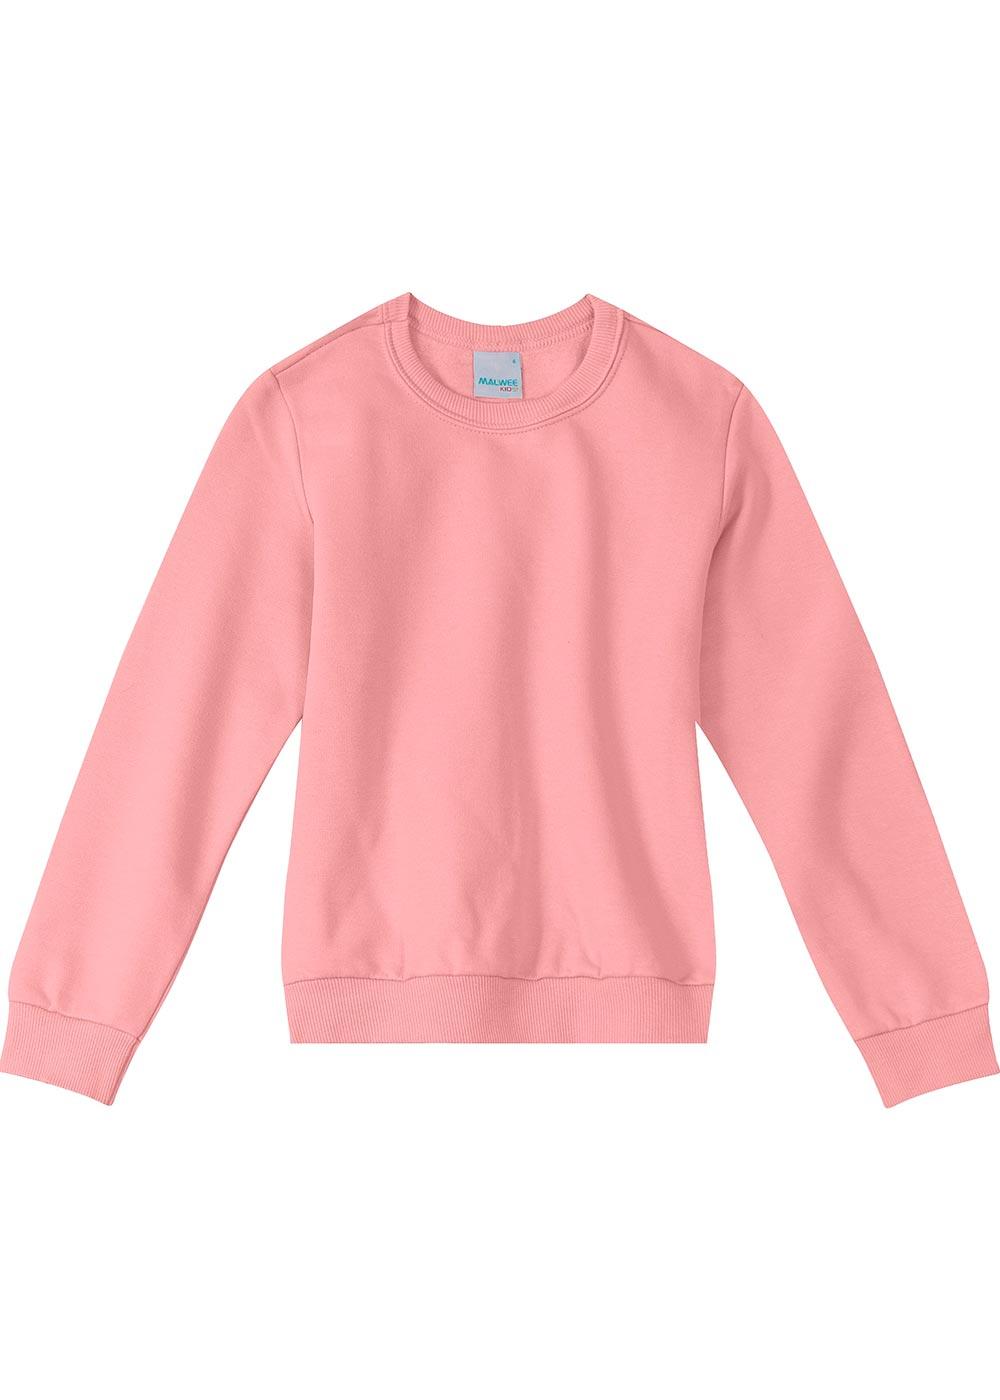 Blusão Infantil Feminino Flanelado Rosa Básico - Malwee